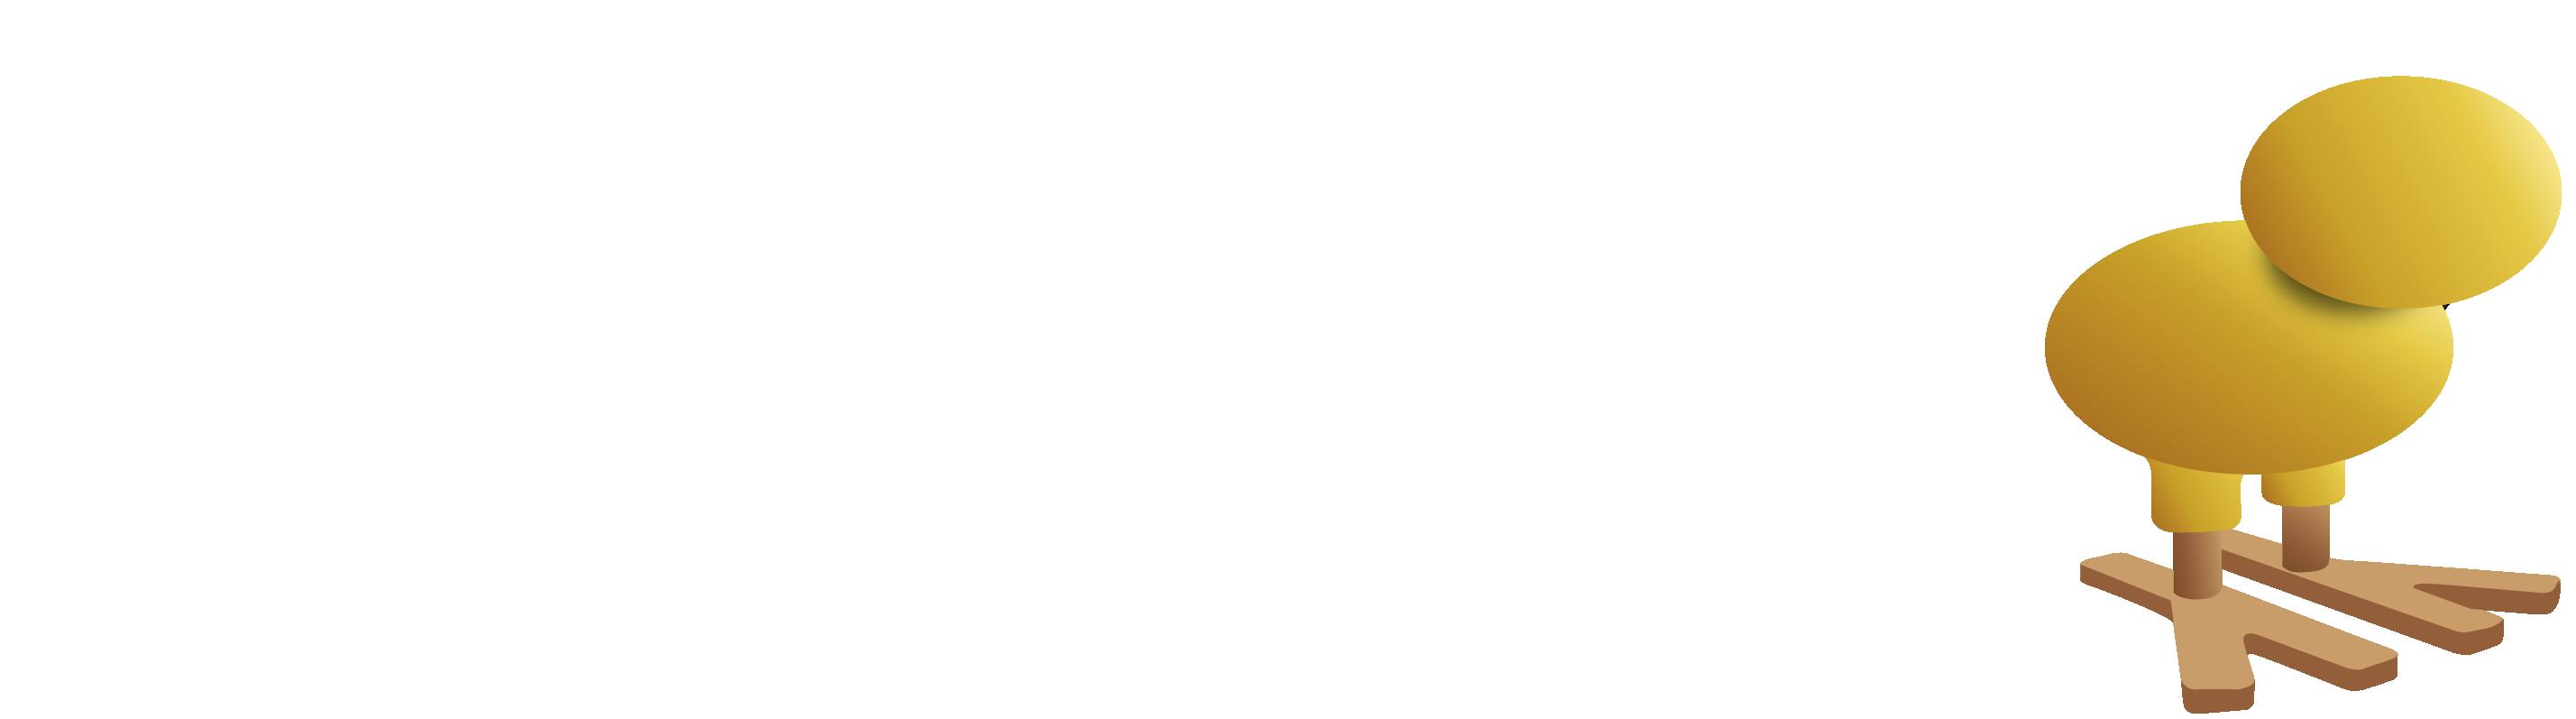 holborn - immobilier